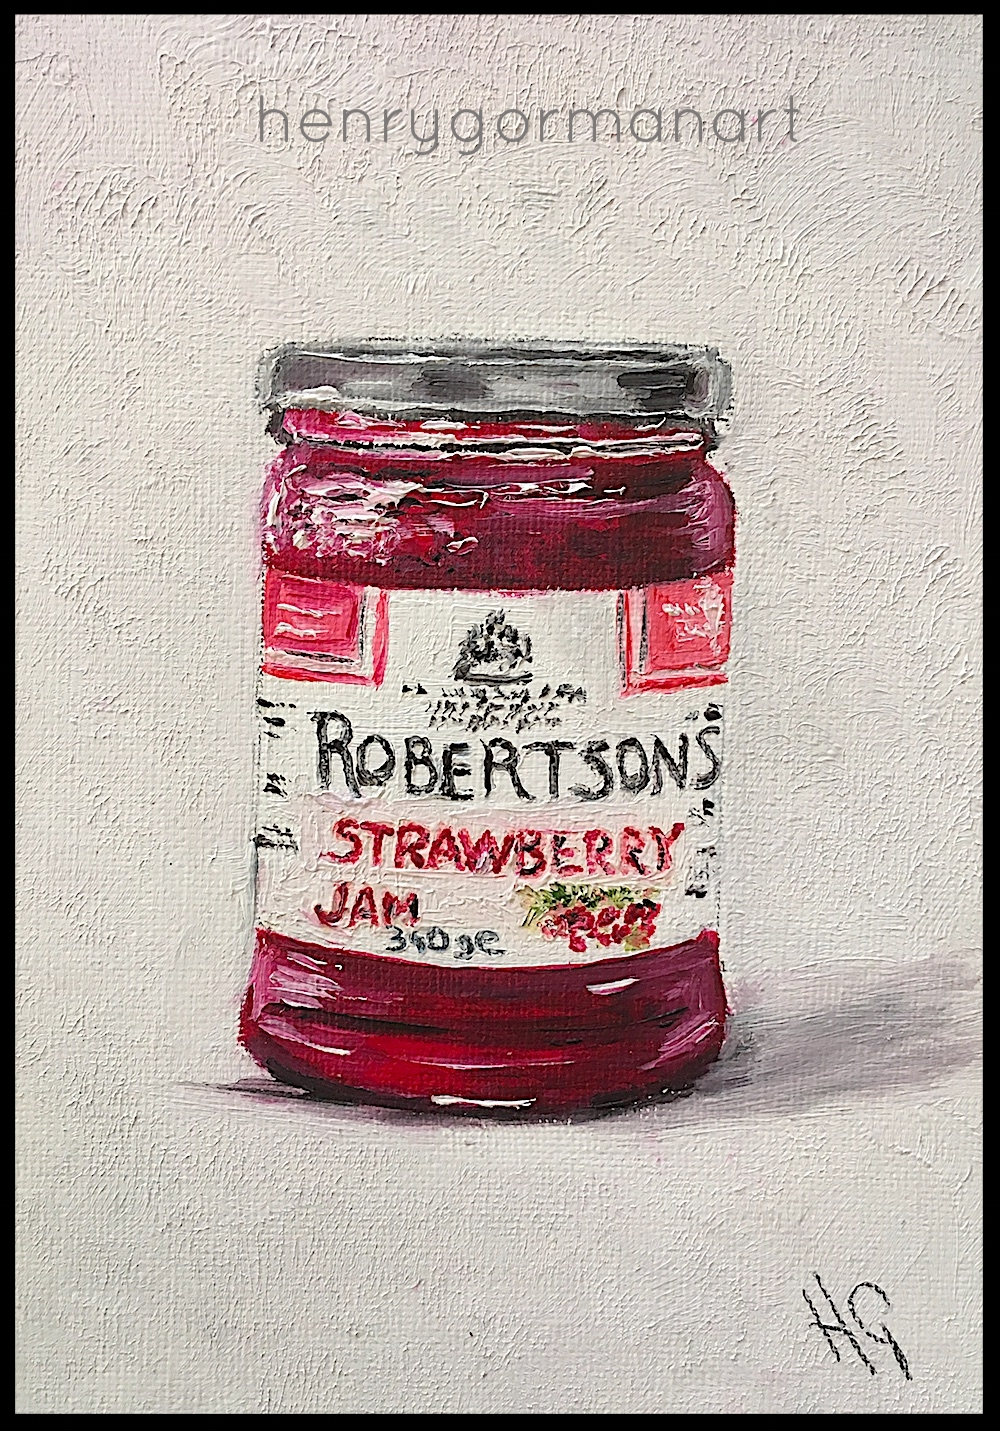 'Strawberry Jam'